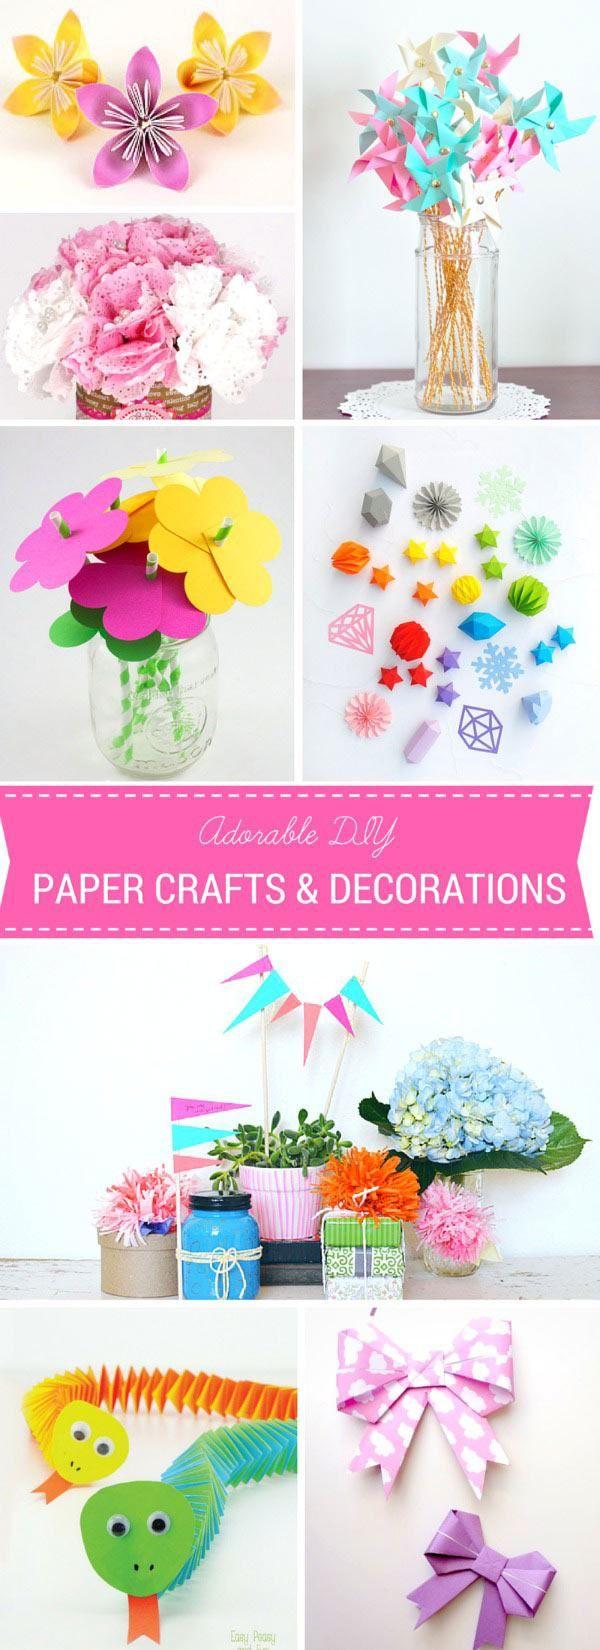 364 Best Kids 39 Crafts Images On Pinterest Fun Crafts